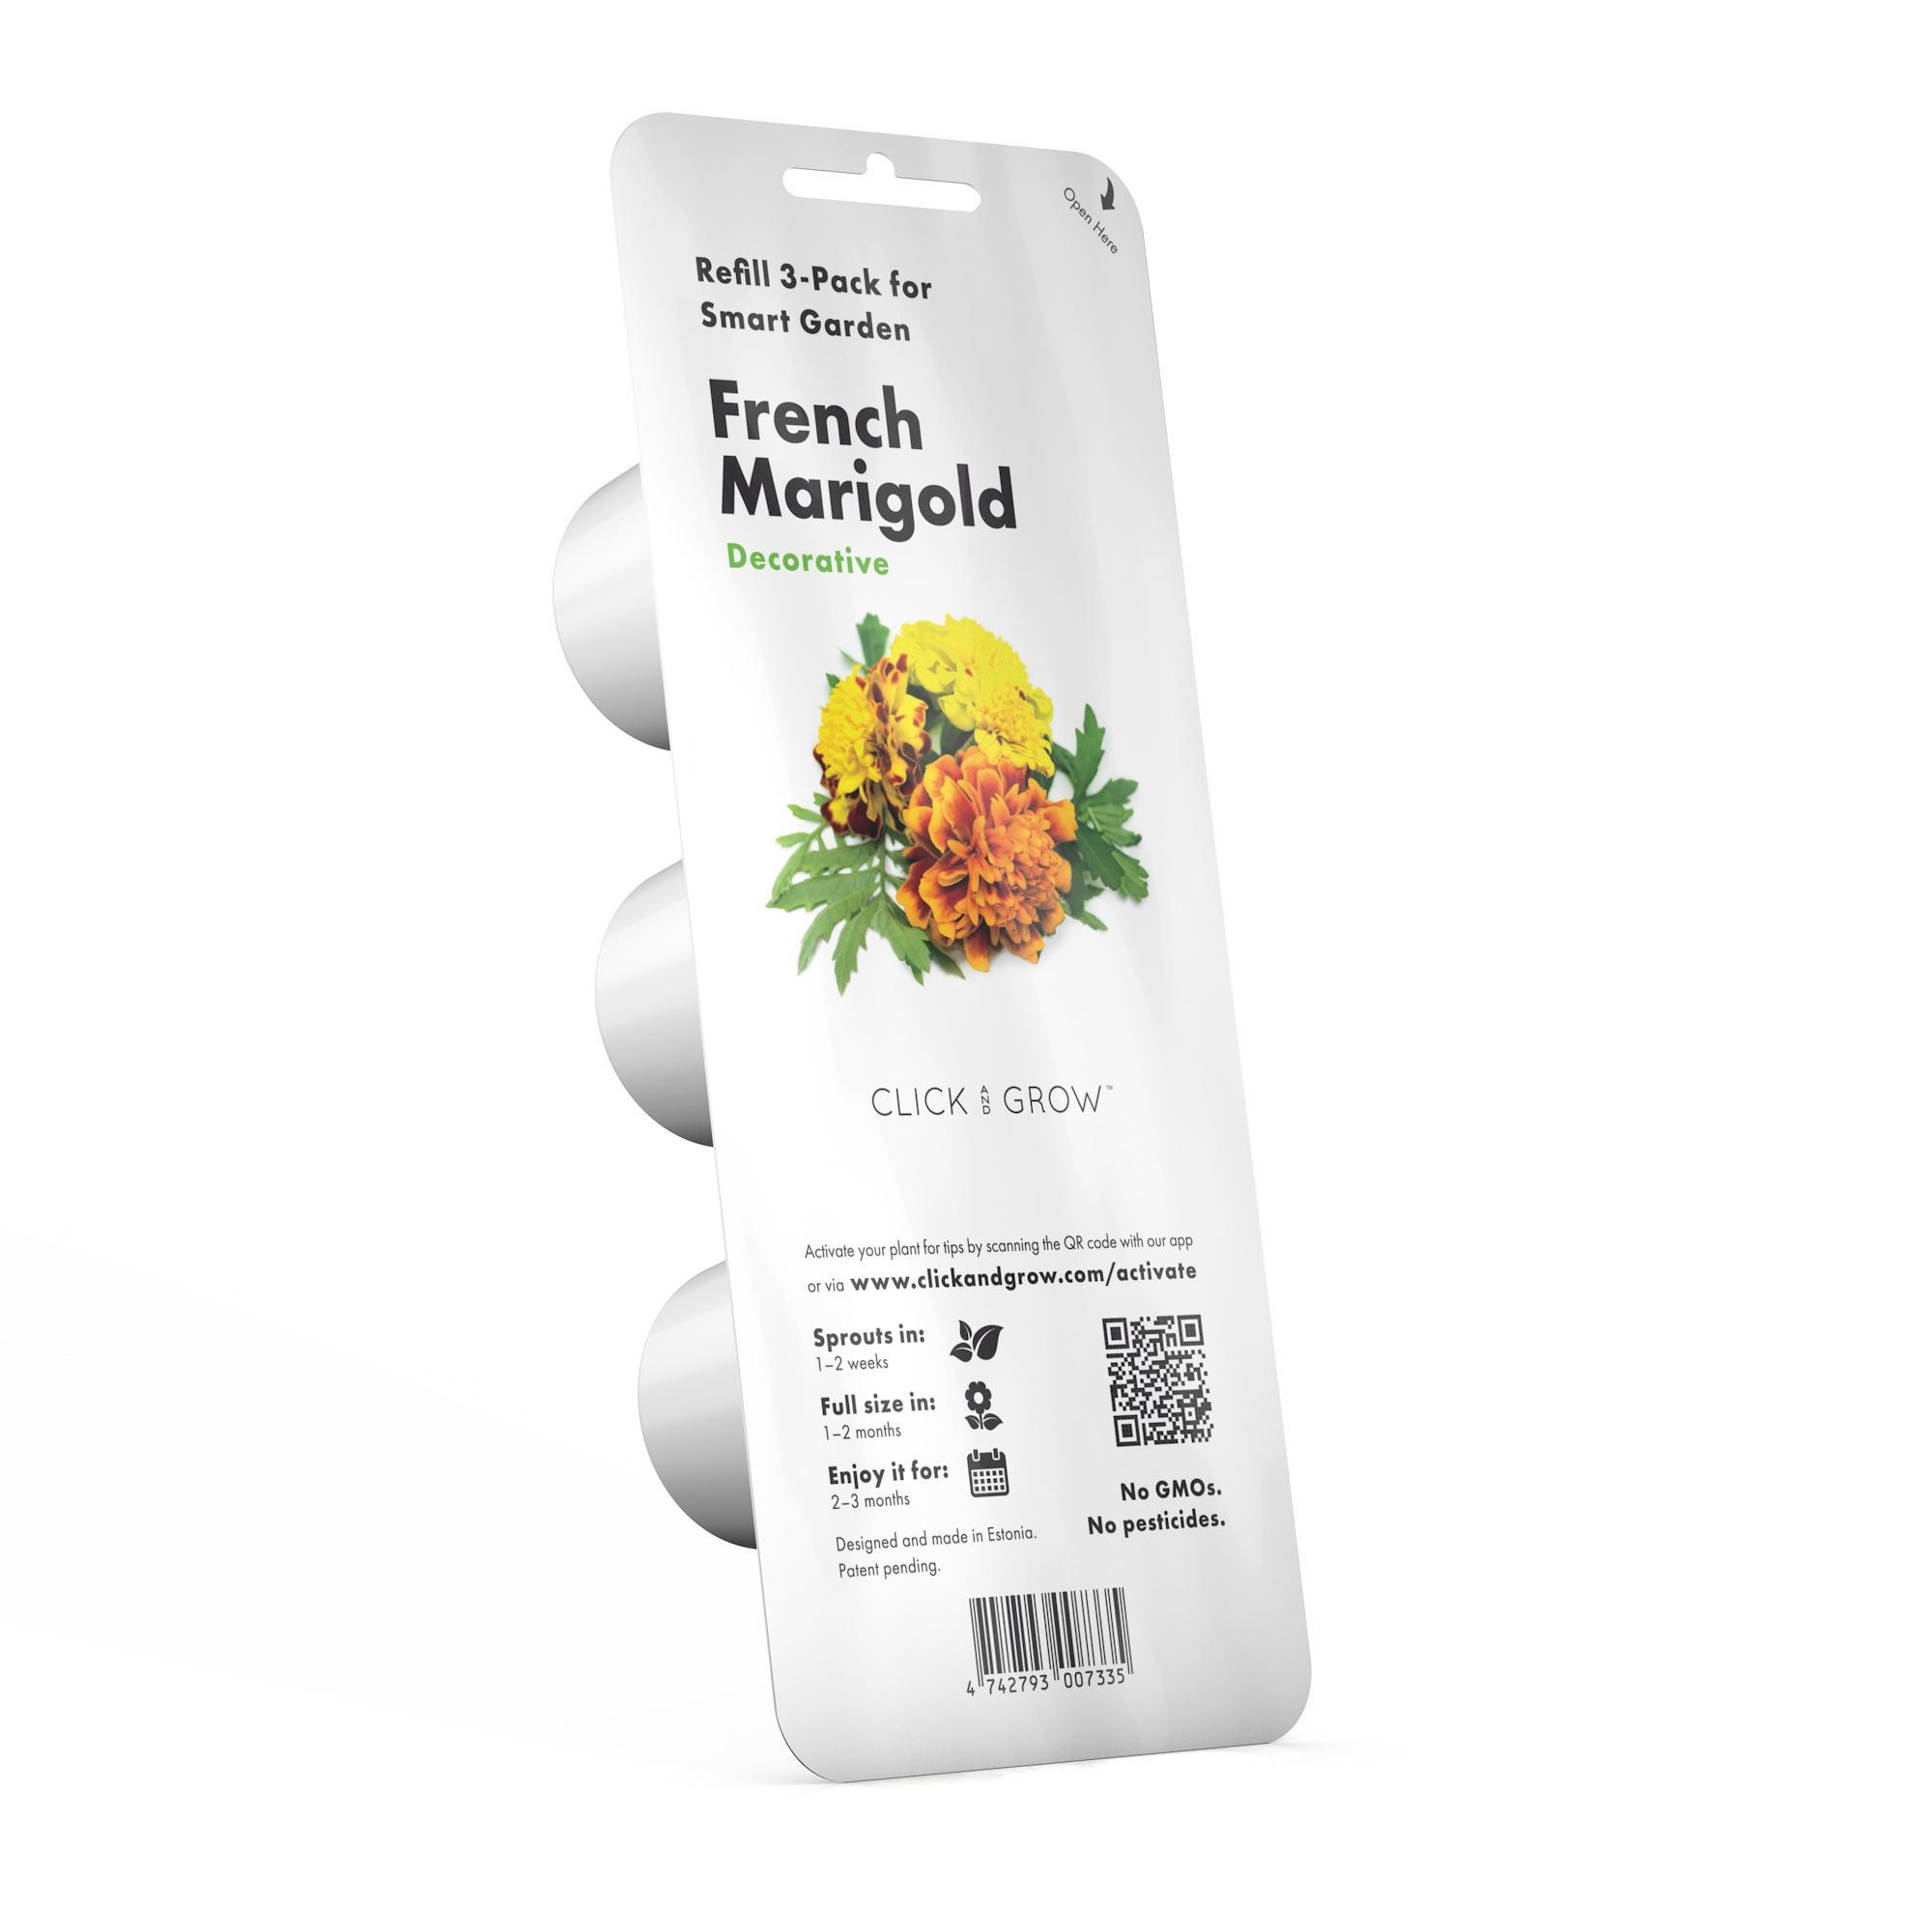 Click and Grow - Refill Pack of 3/smart garden/various choice/100% guarantee success growth/smart soil/natural/green/farmer/no GMO/3 step/flower/vege/herbs